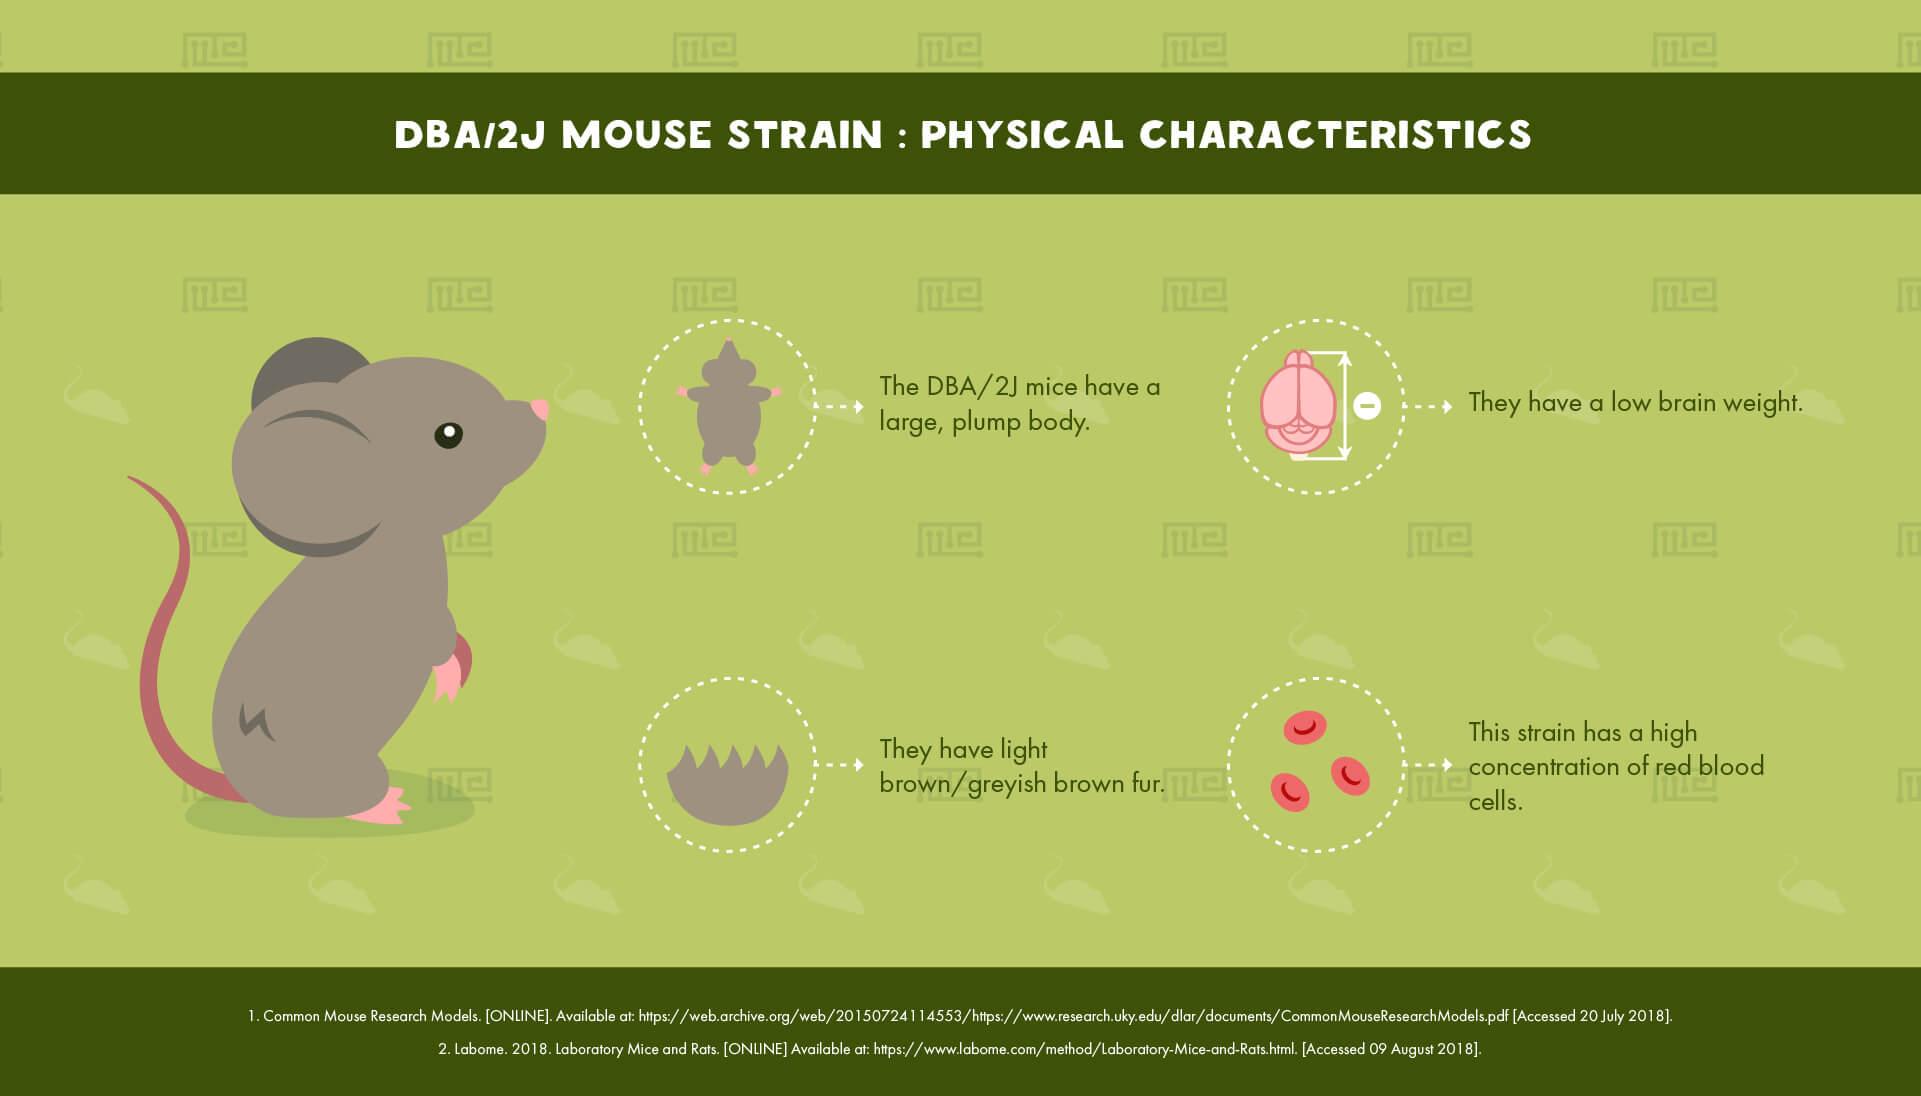 DBA/2J Mouse Strain - Physical Characteristics